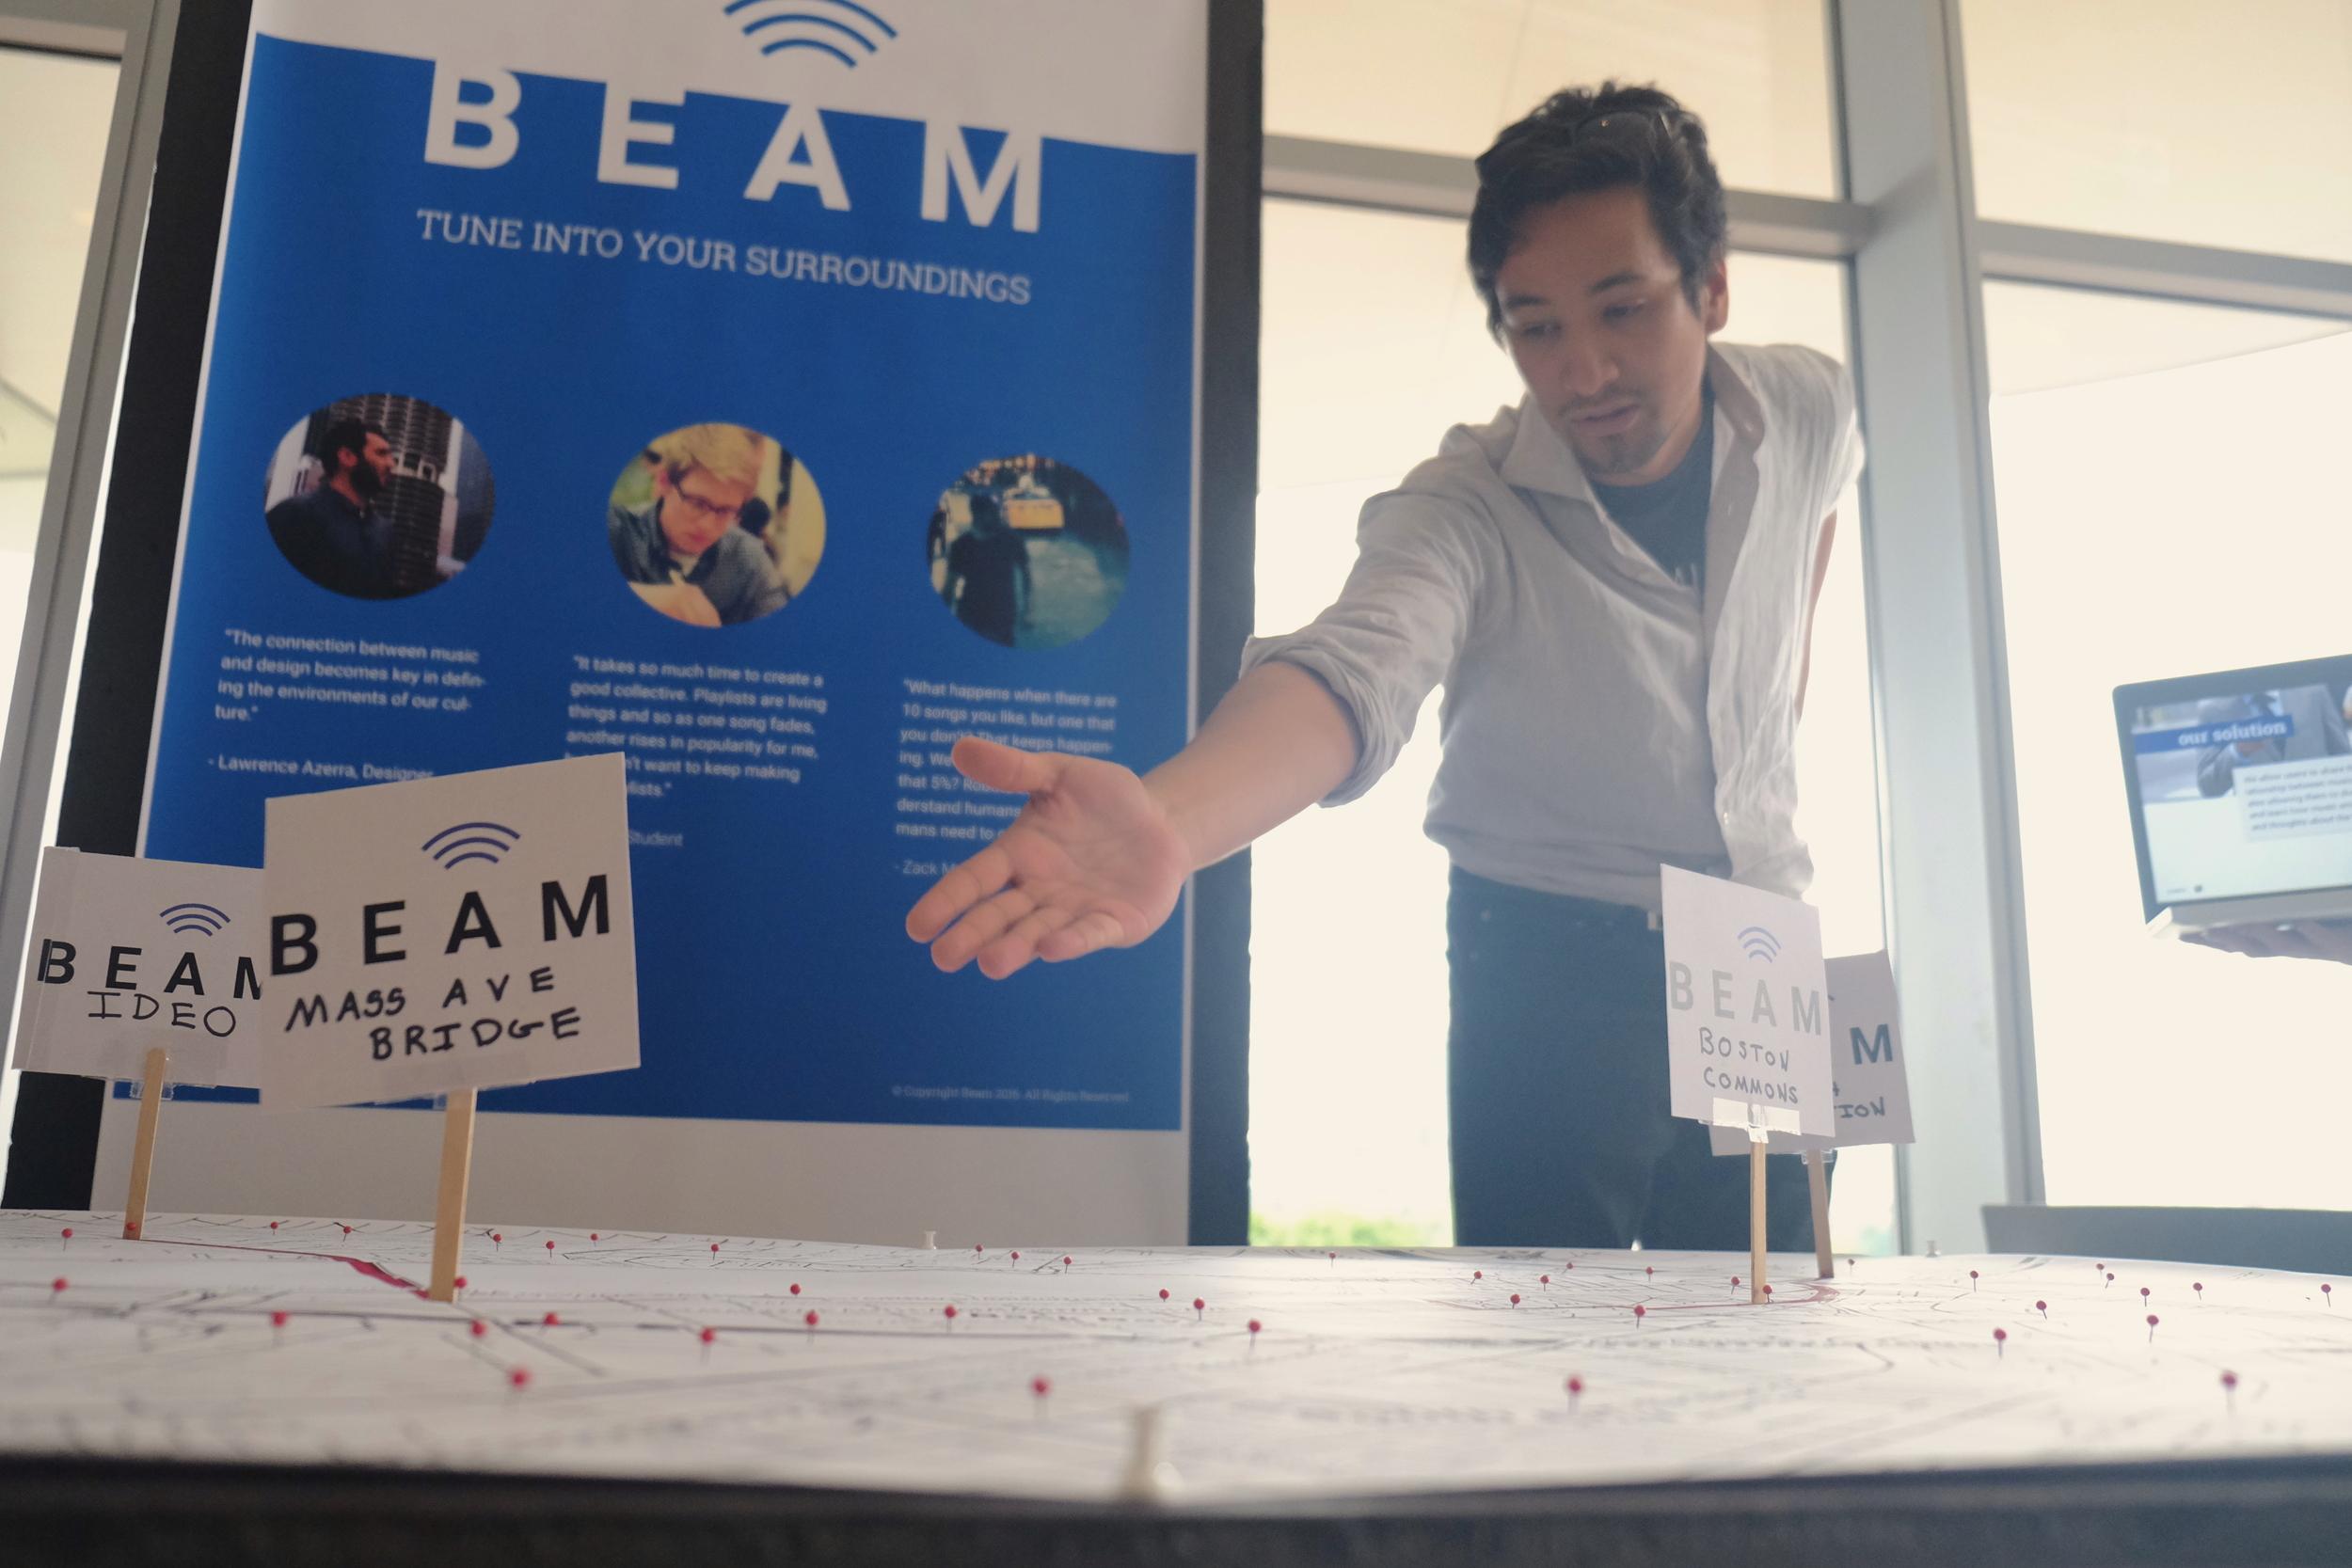 OMI Fellow Raul Feliz presents the Beam project. Photo Credit: Pablo Lalama Salazar